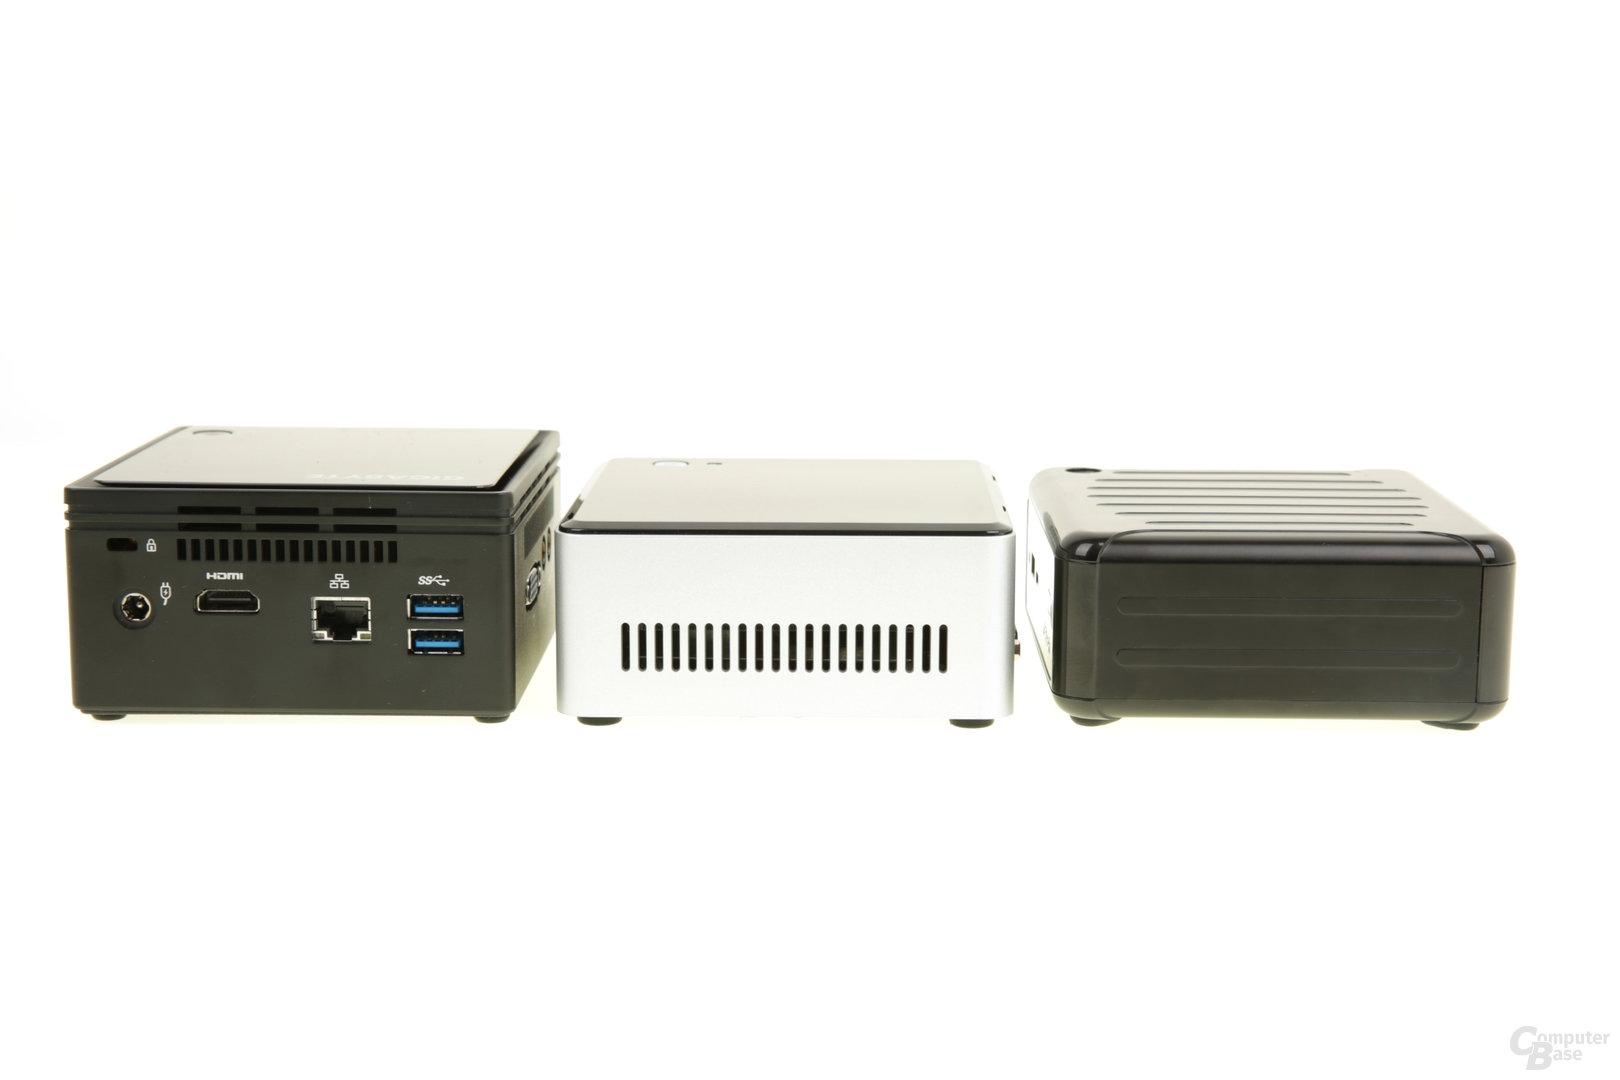 Gigabyte Brix, Intel NUC und ASRock Beebox